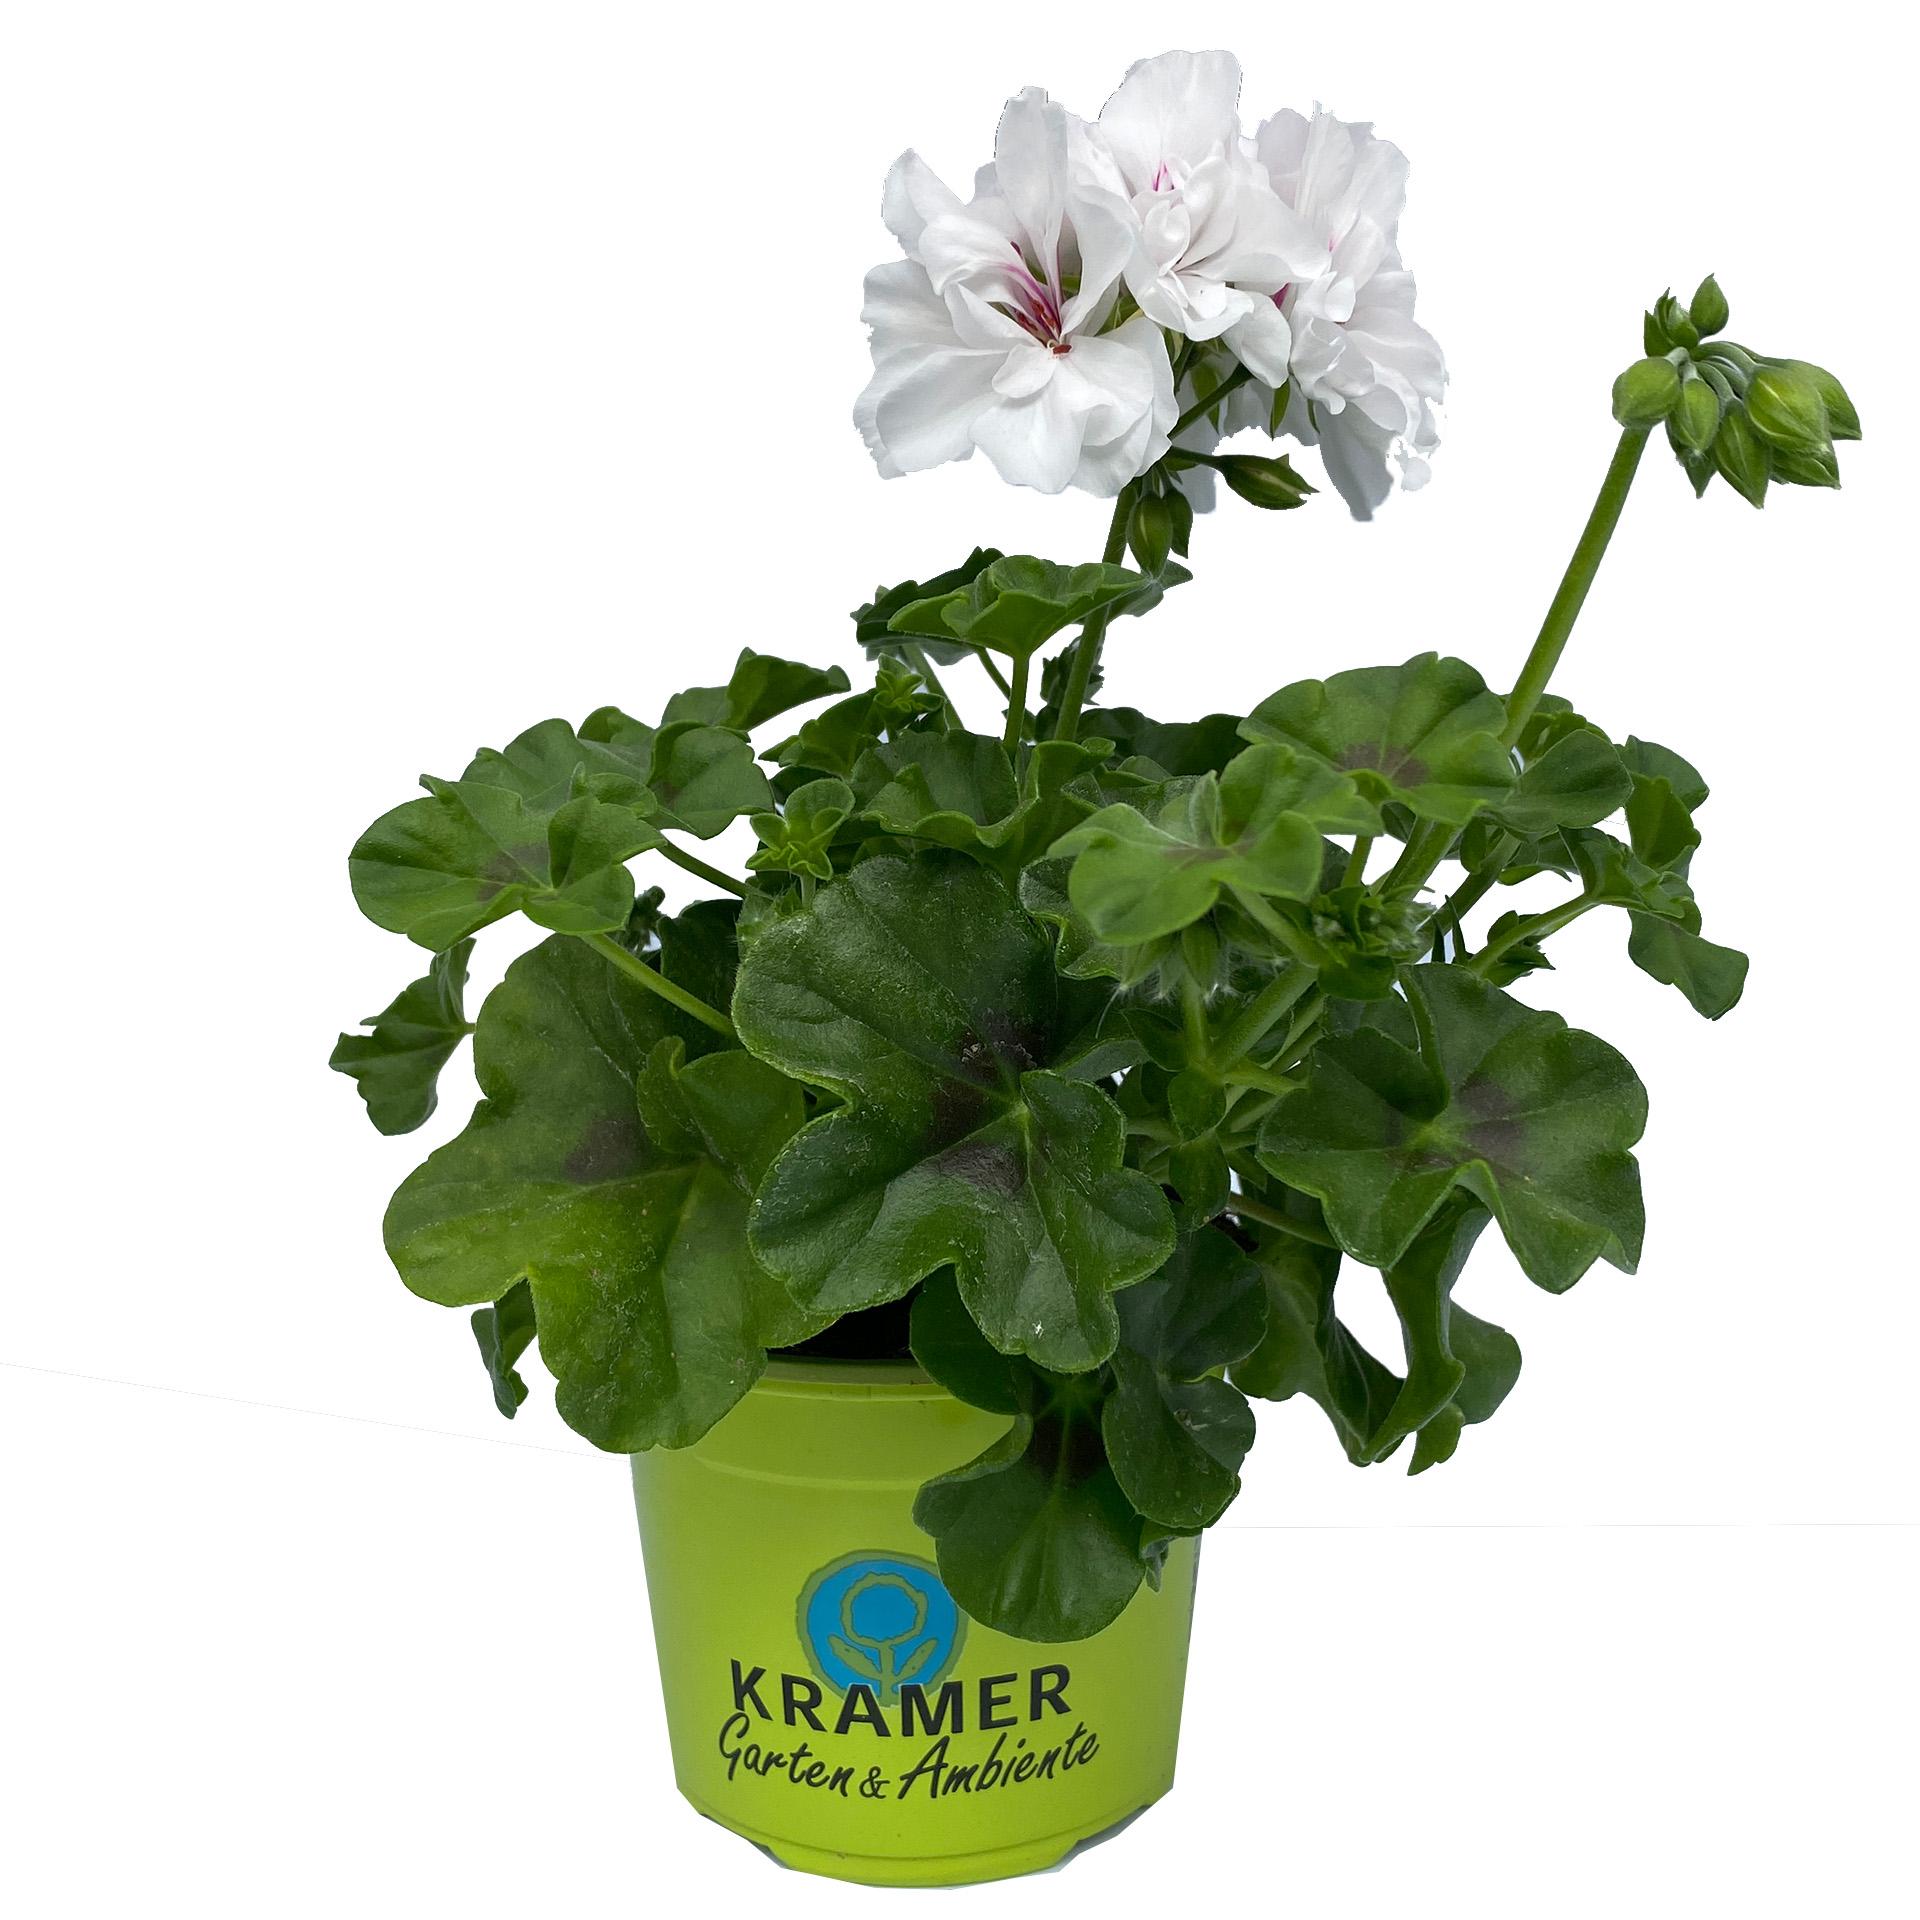 Geranie hängend - Pelargonium peltatum 'Sunflair Eva' weiß, 12cm Topf